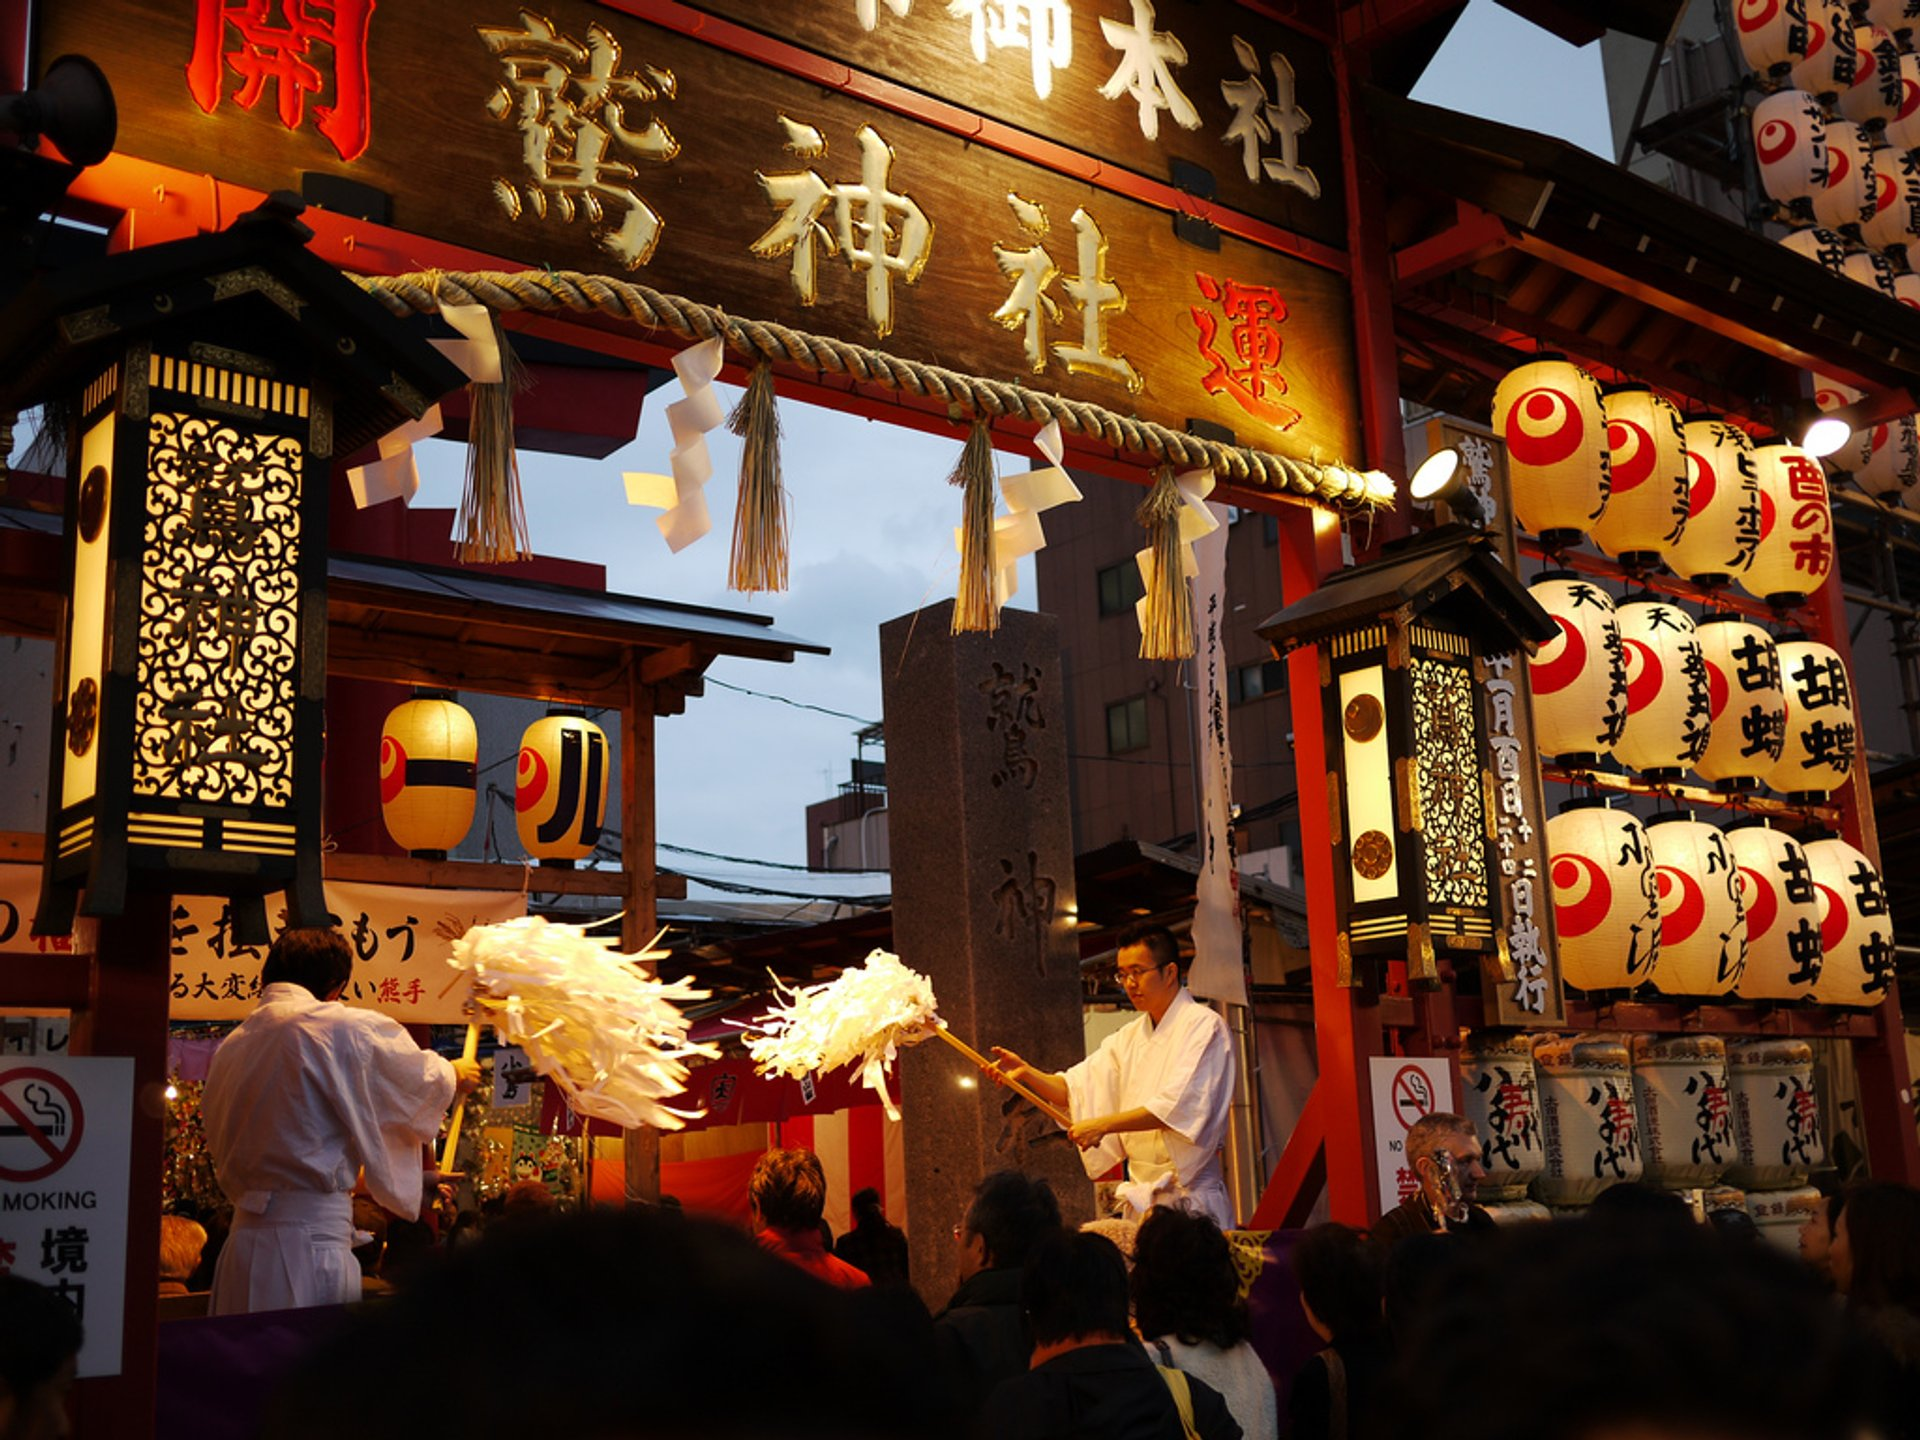 Best time to see Asakusa Tori No Ichi Fair in Tokyo 2020